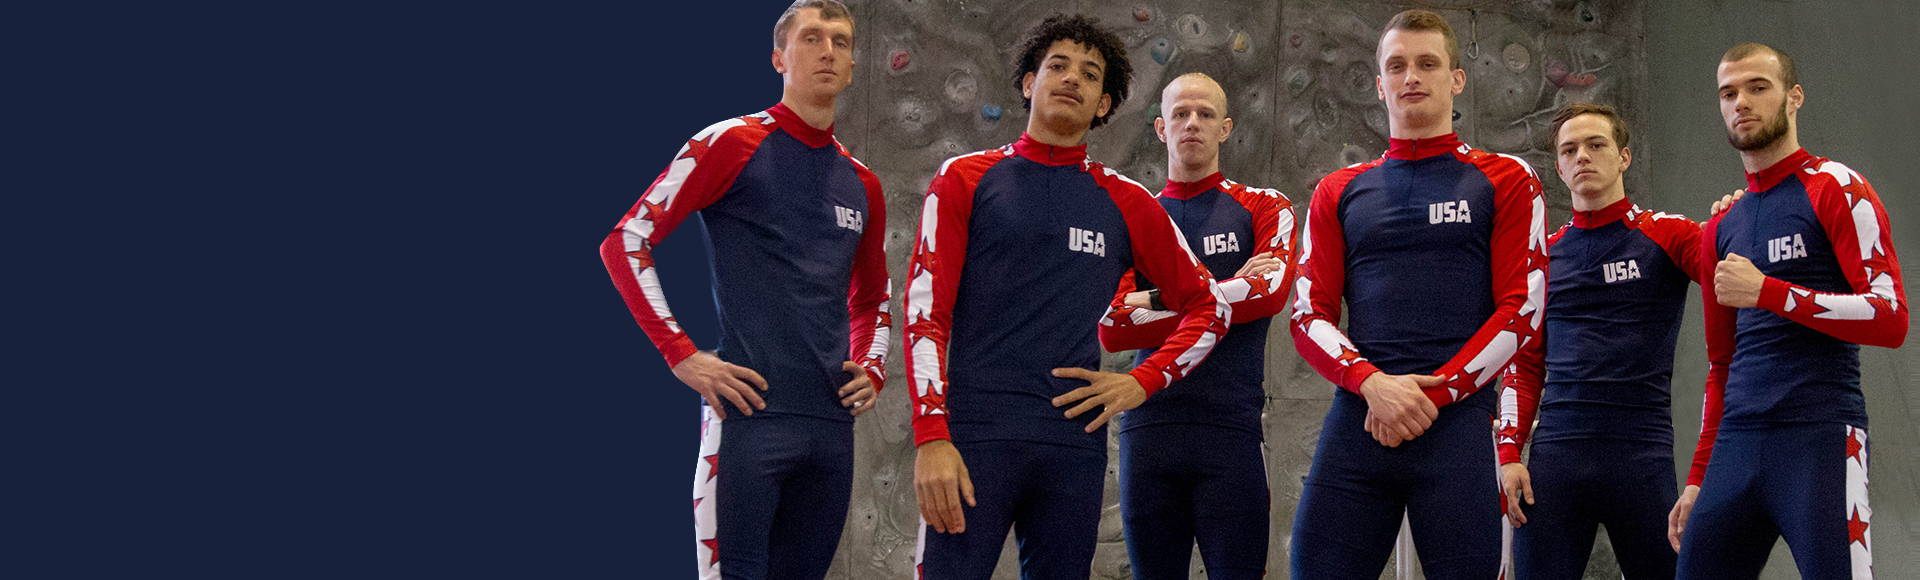 Elite Performance Uniforms